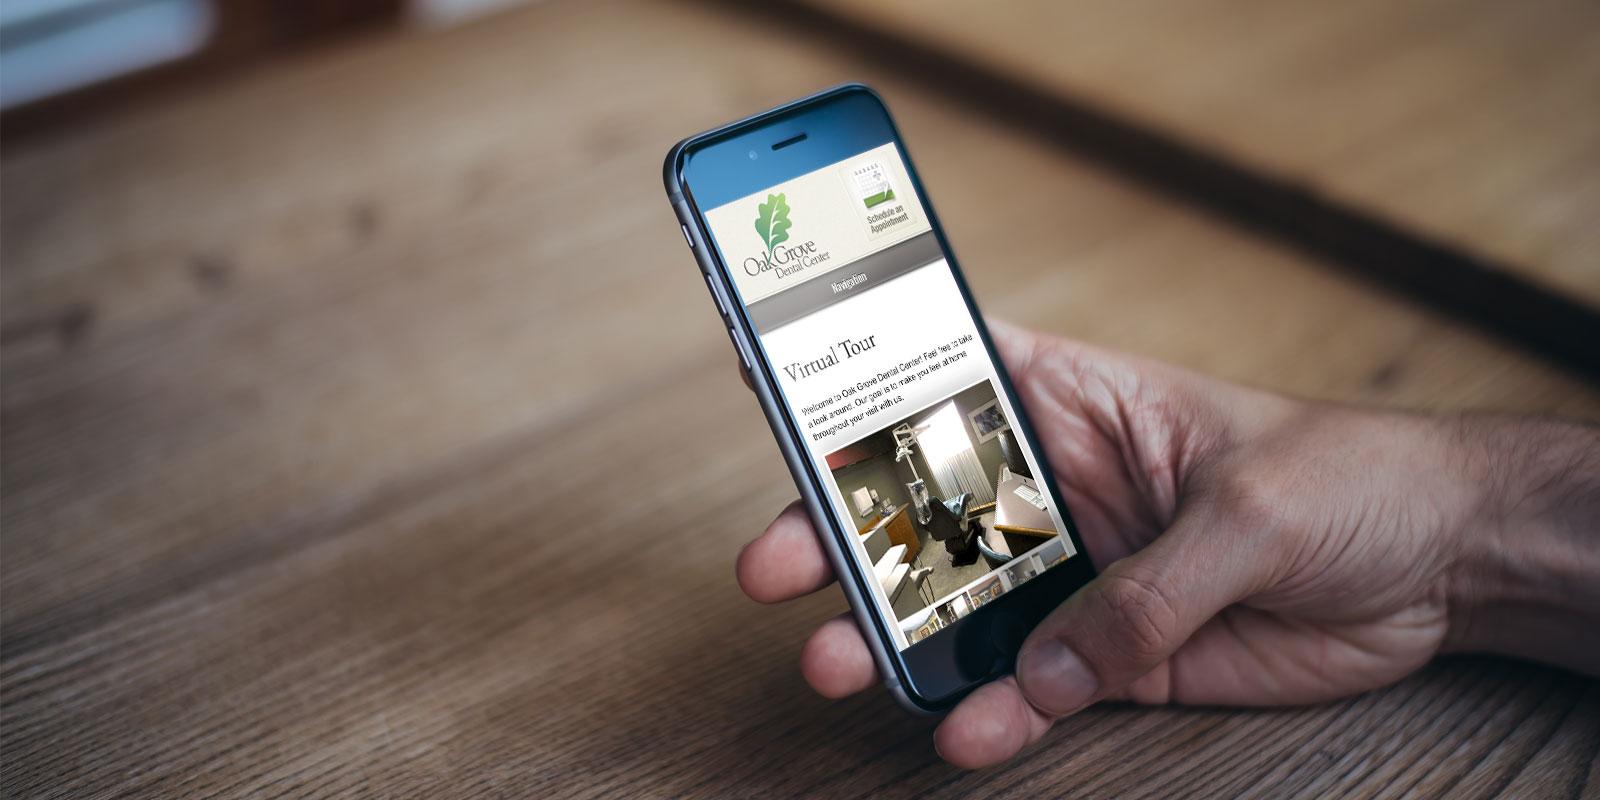 Oak Grove Dental Center website on a smartphone